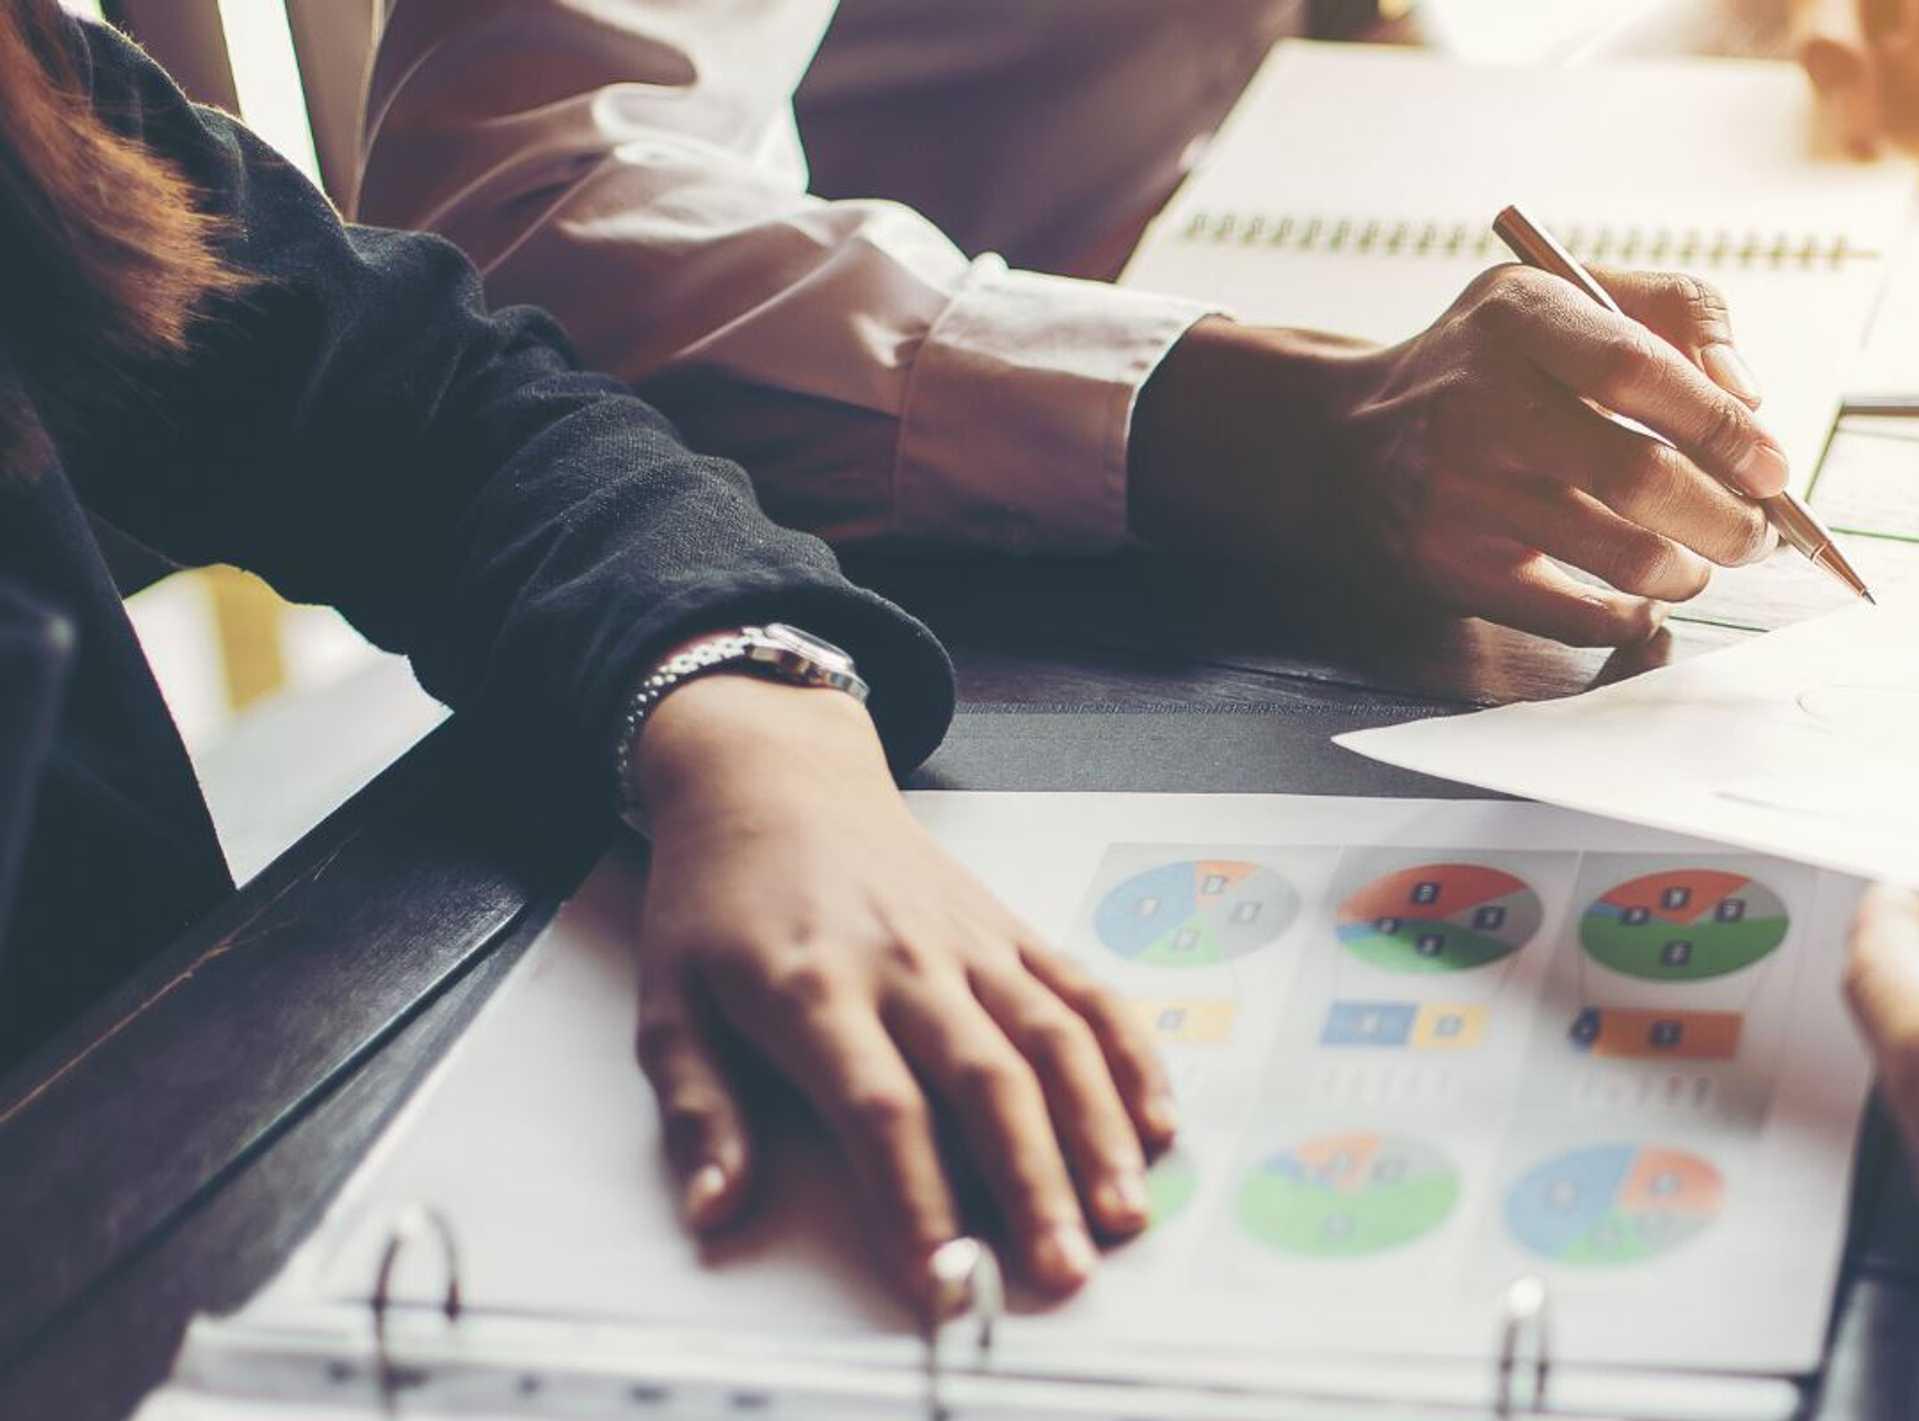 Accruent - Resources - Webinars - EMS November 2020 Higher Education Status Update - Hero